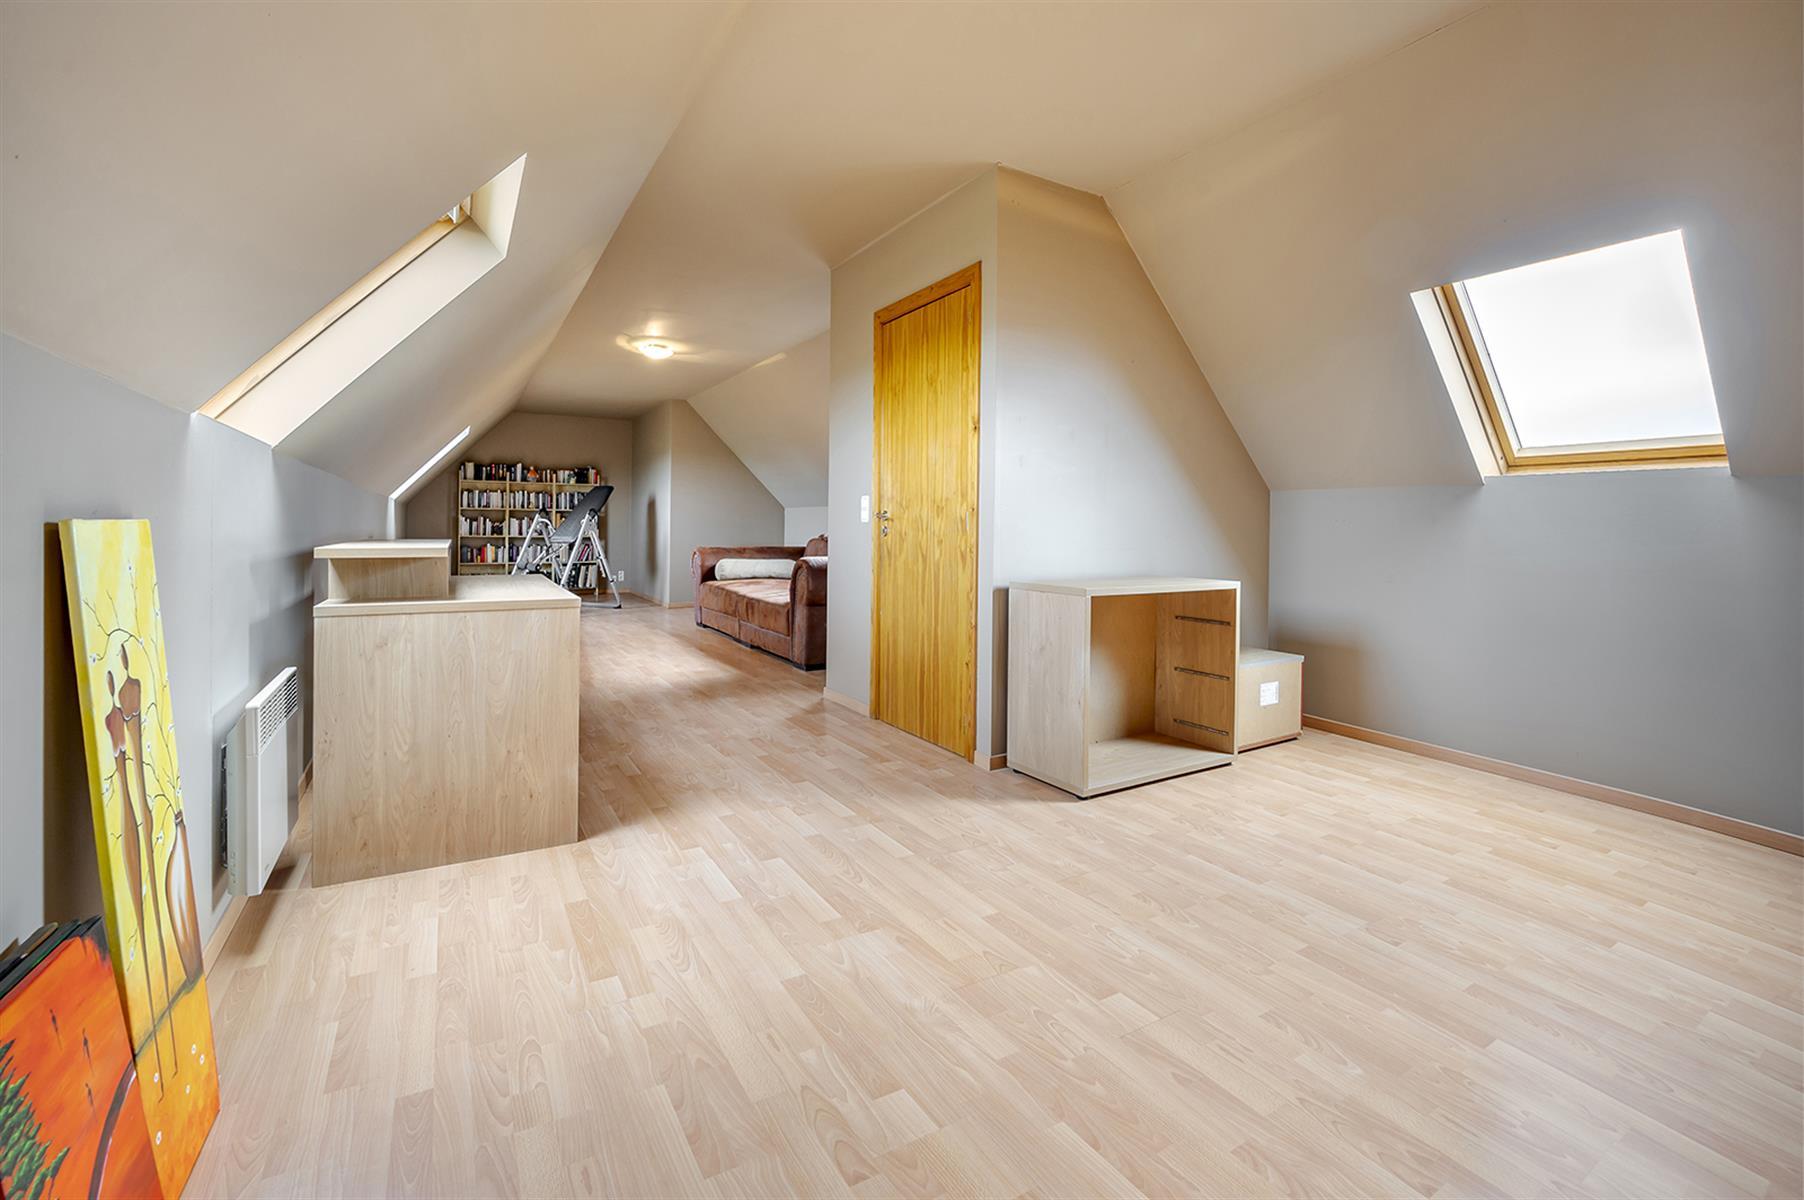 Maison - Orp-Jauche - #4014627-22